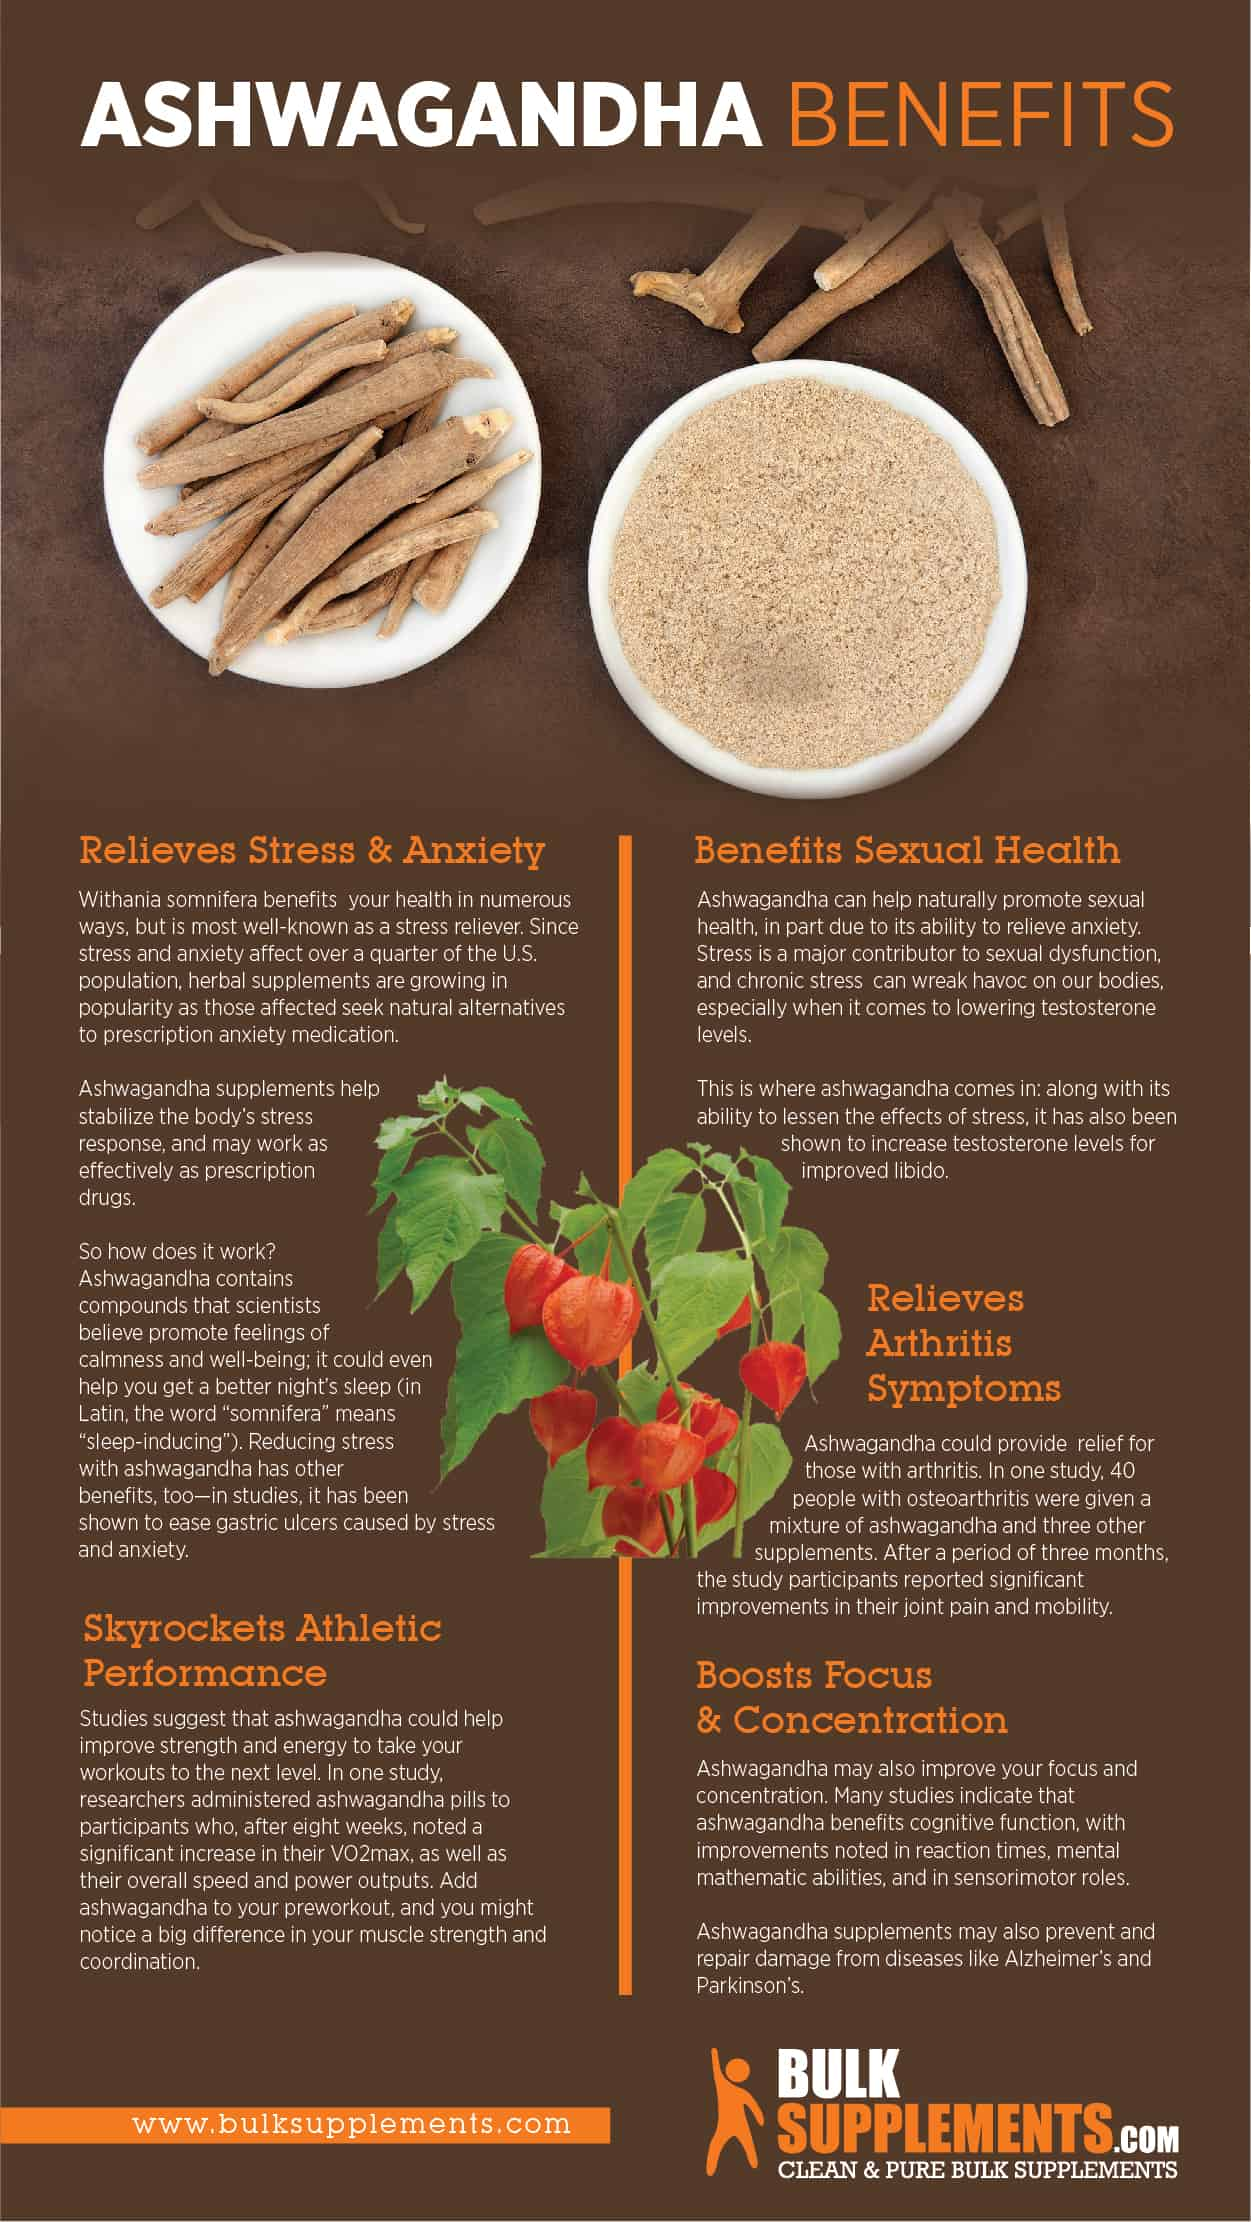 Ashwagandha Root Benefits, Dosage, Side Effects